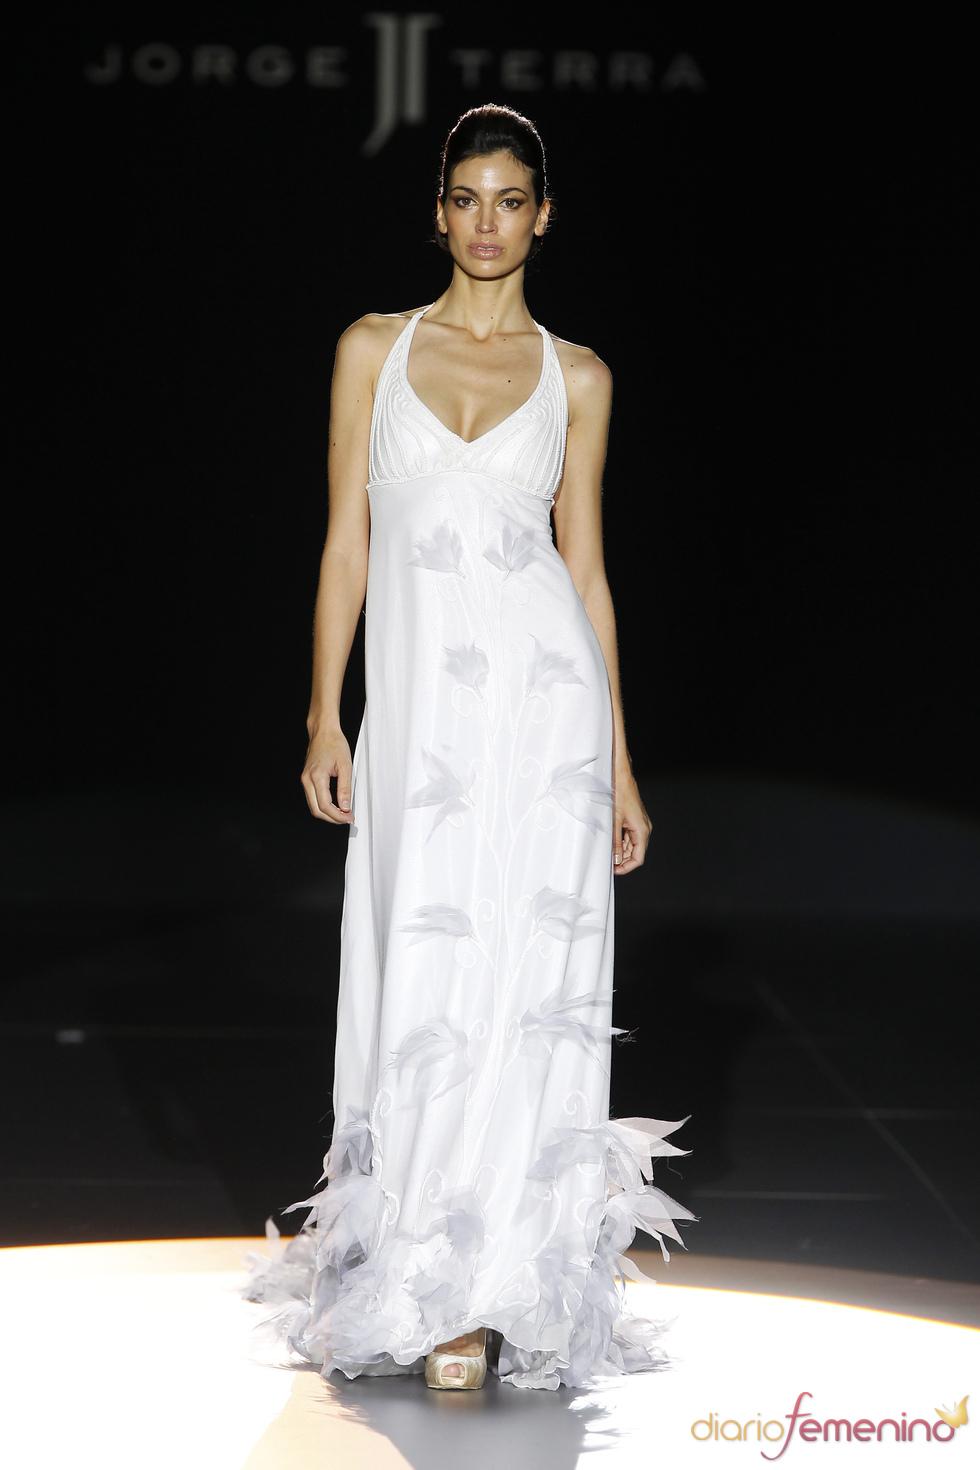 Vestido de novia con plumas de Jorge Terra